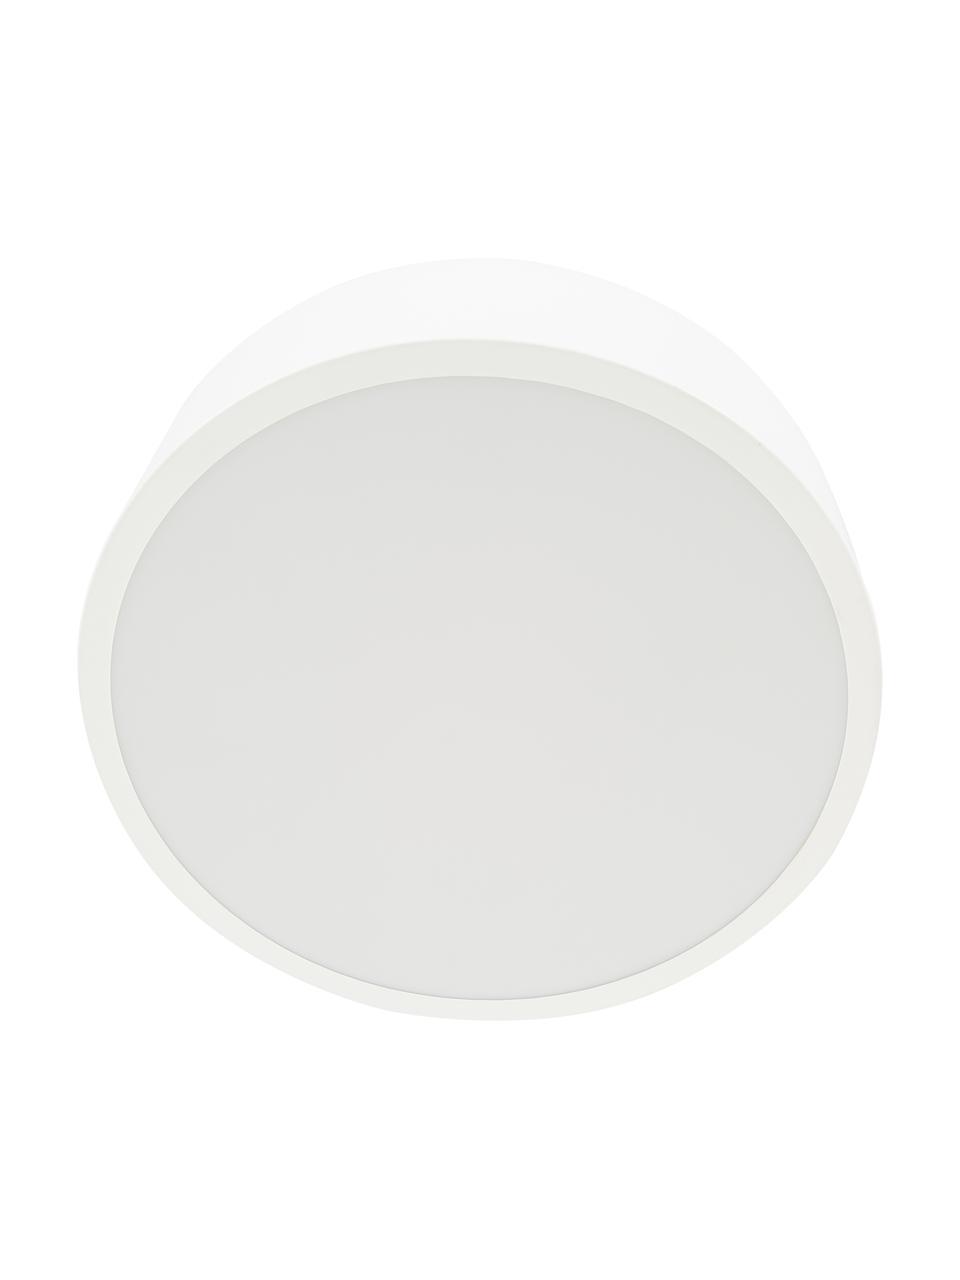 Plafoniera stile nordico in metallo Ole, Paralume: metallo verniciato a polv, Baldacchino: metallo verniciato a polv, Disco diffusore: acrilico, Bianco opaco, Ø 35 x Alt. 18 cm